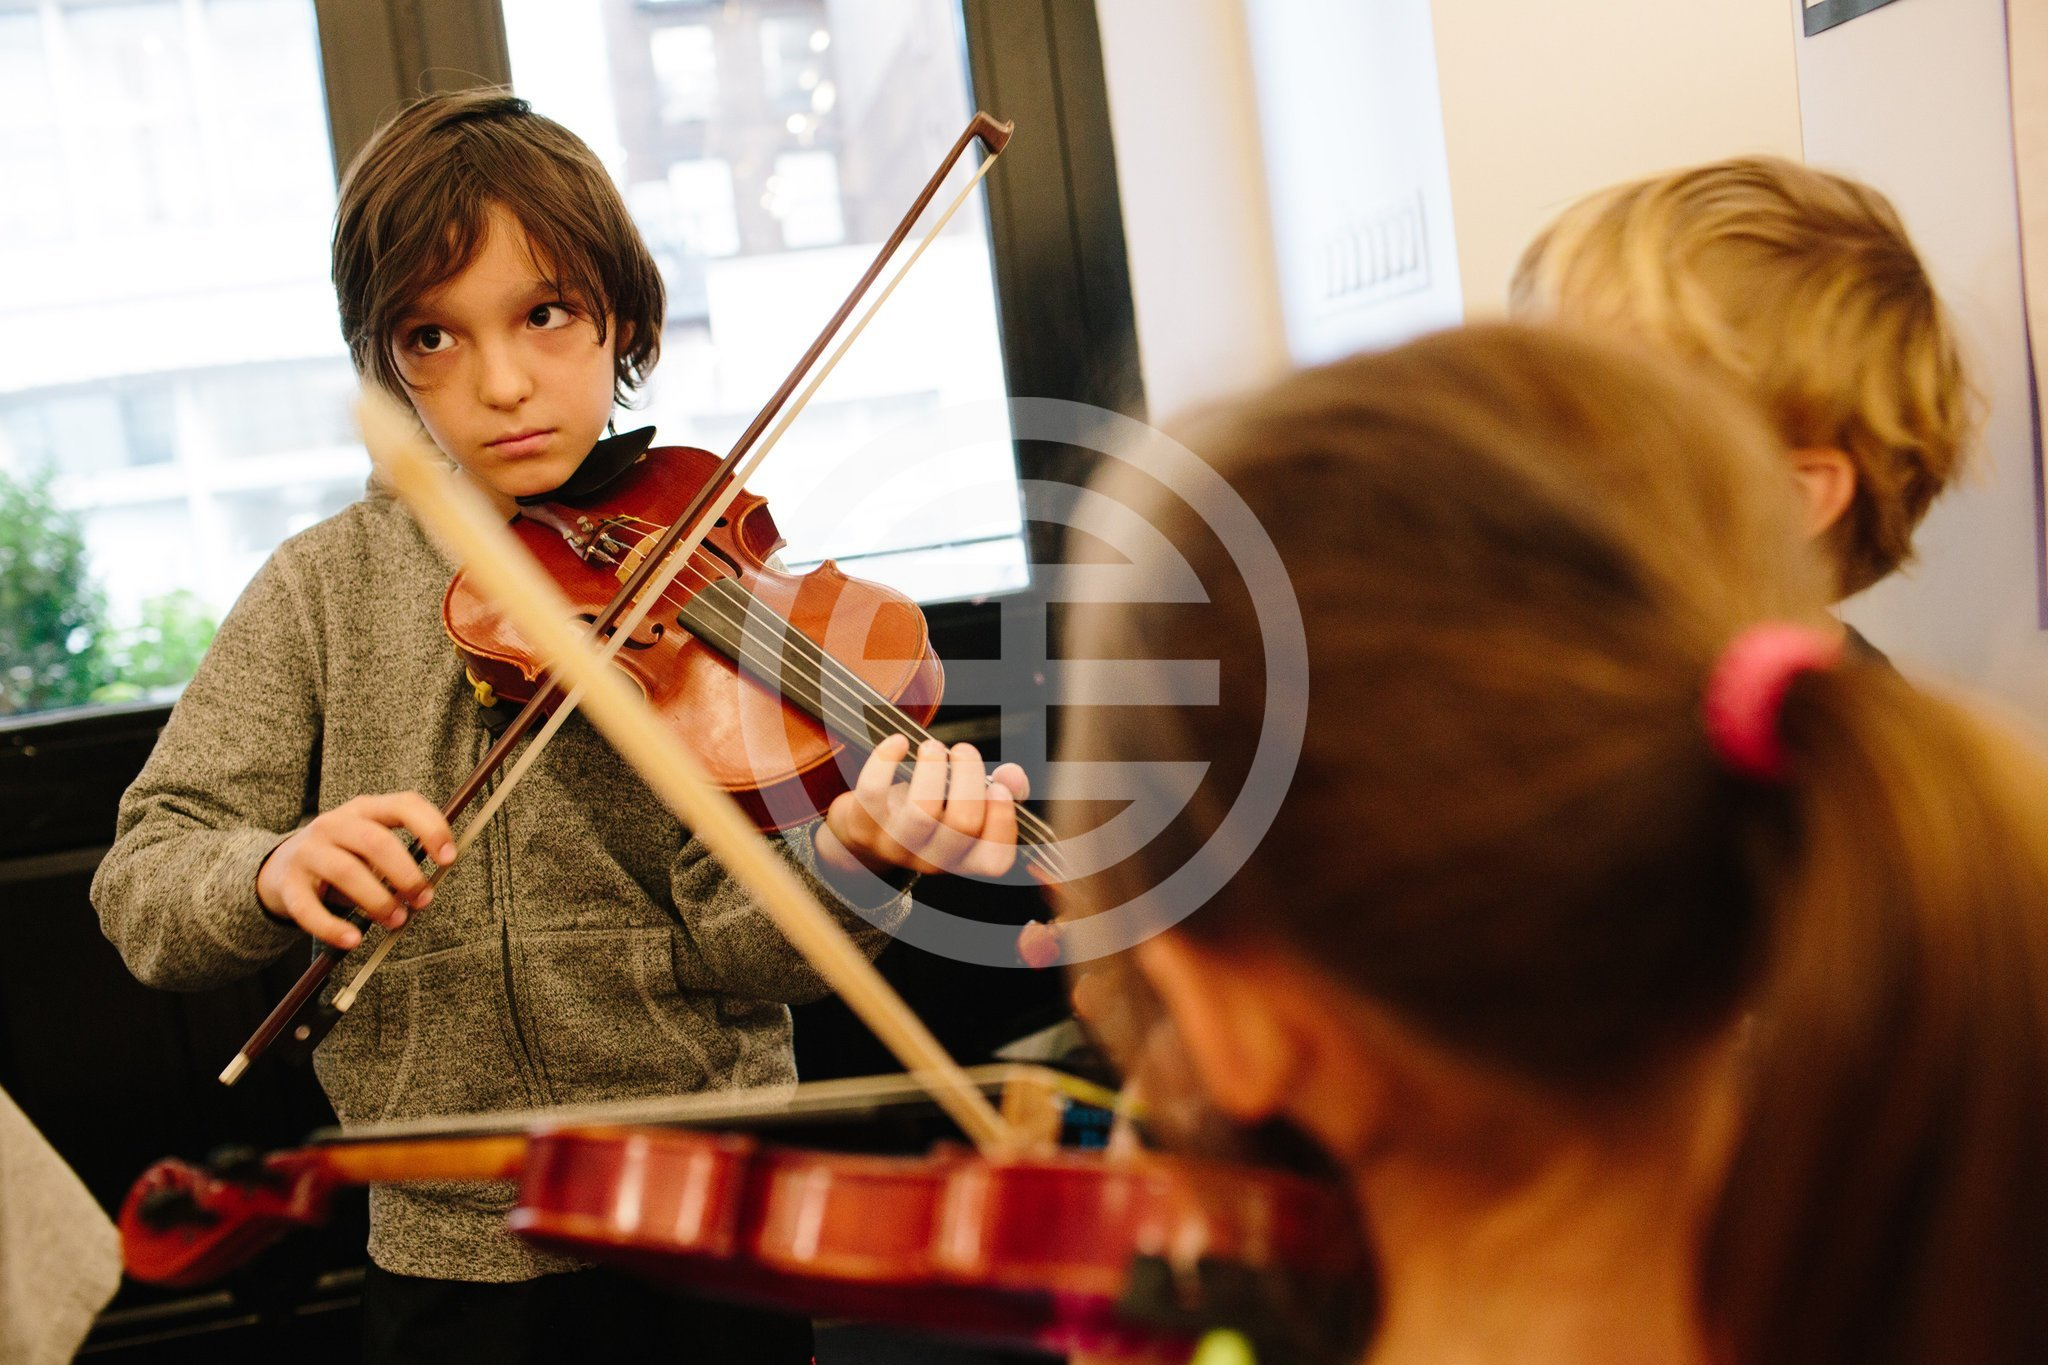 Portfolio学校学生在为电影集作弹奏音乐